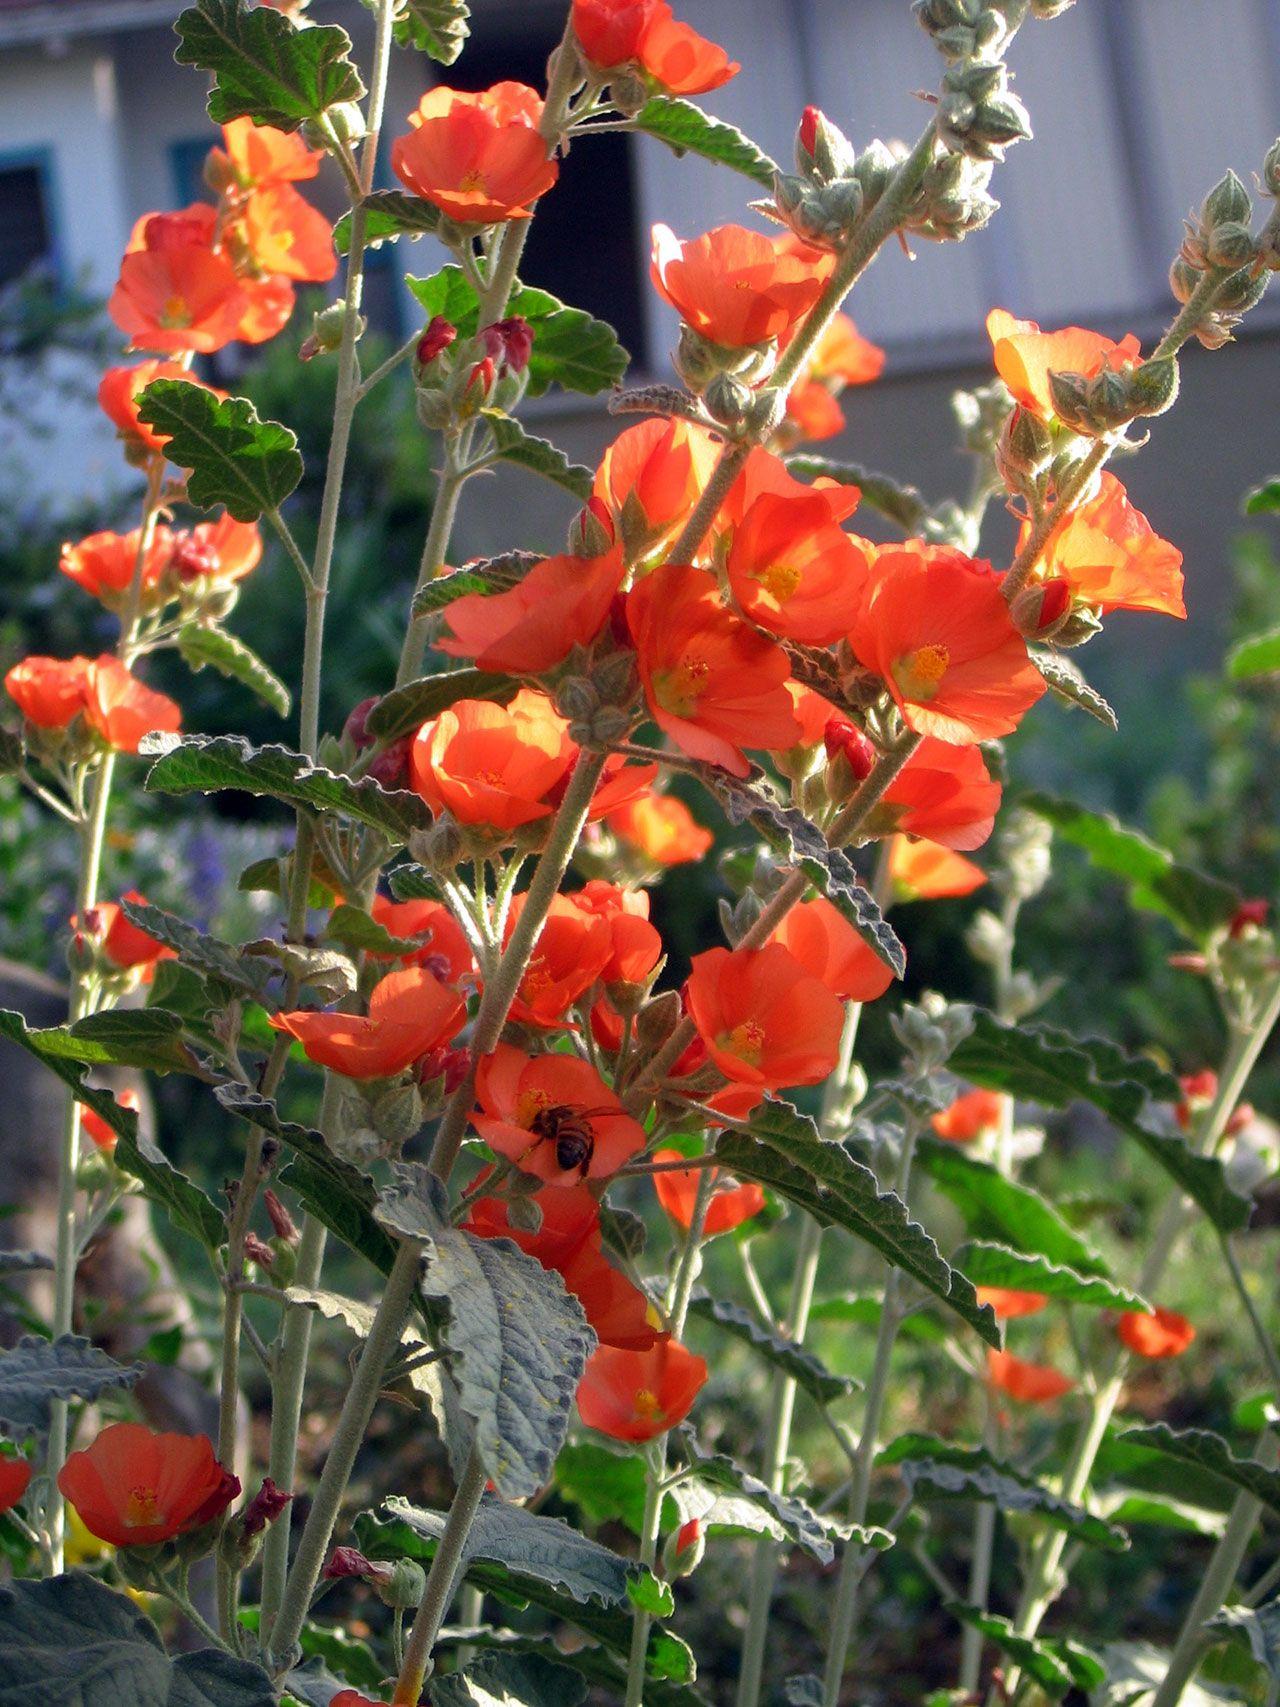 Best Of Native California Plants Drought tolerant